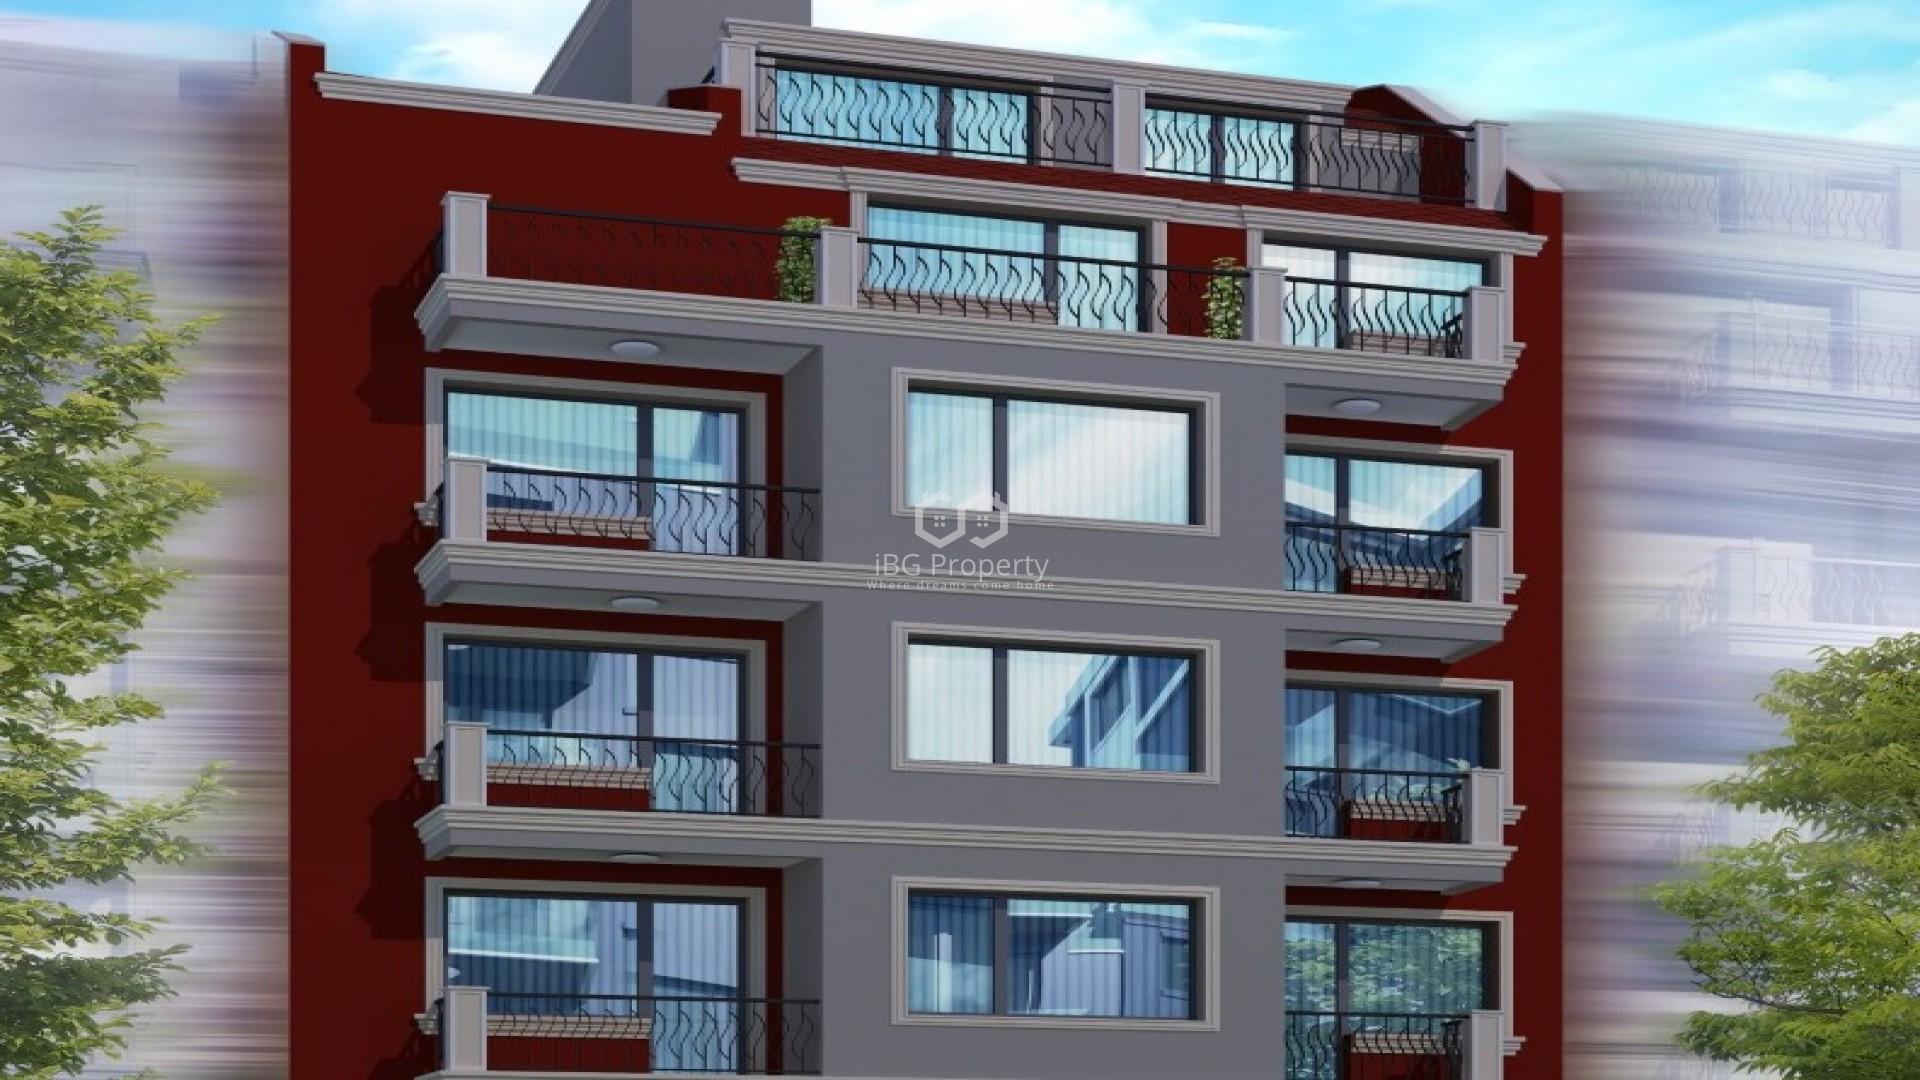 Тристаен апартамент Цветен квартал Варна 98 m2